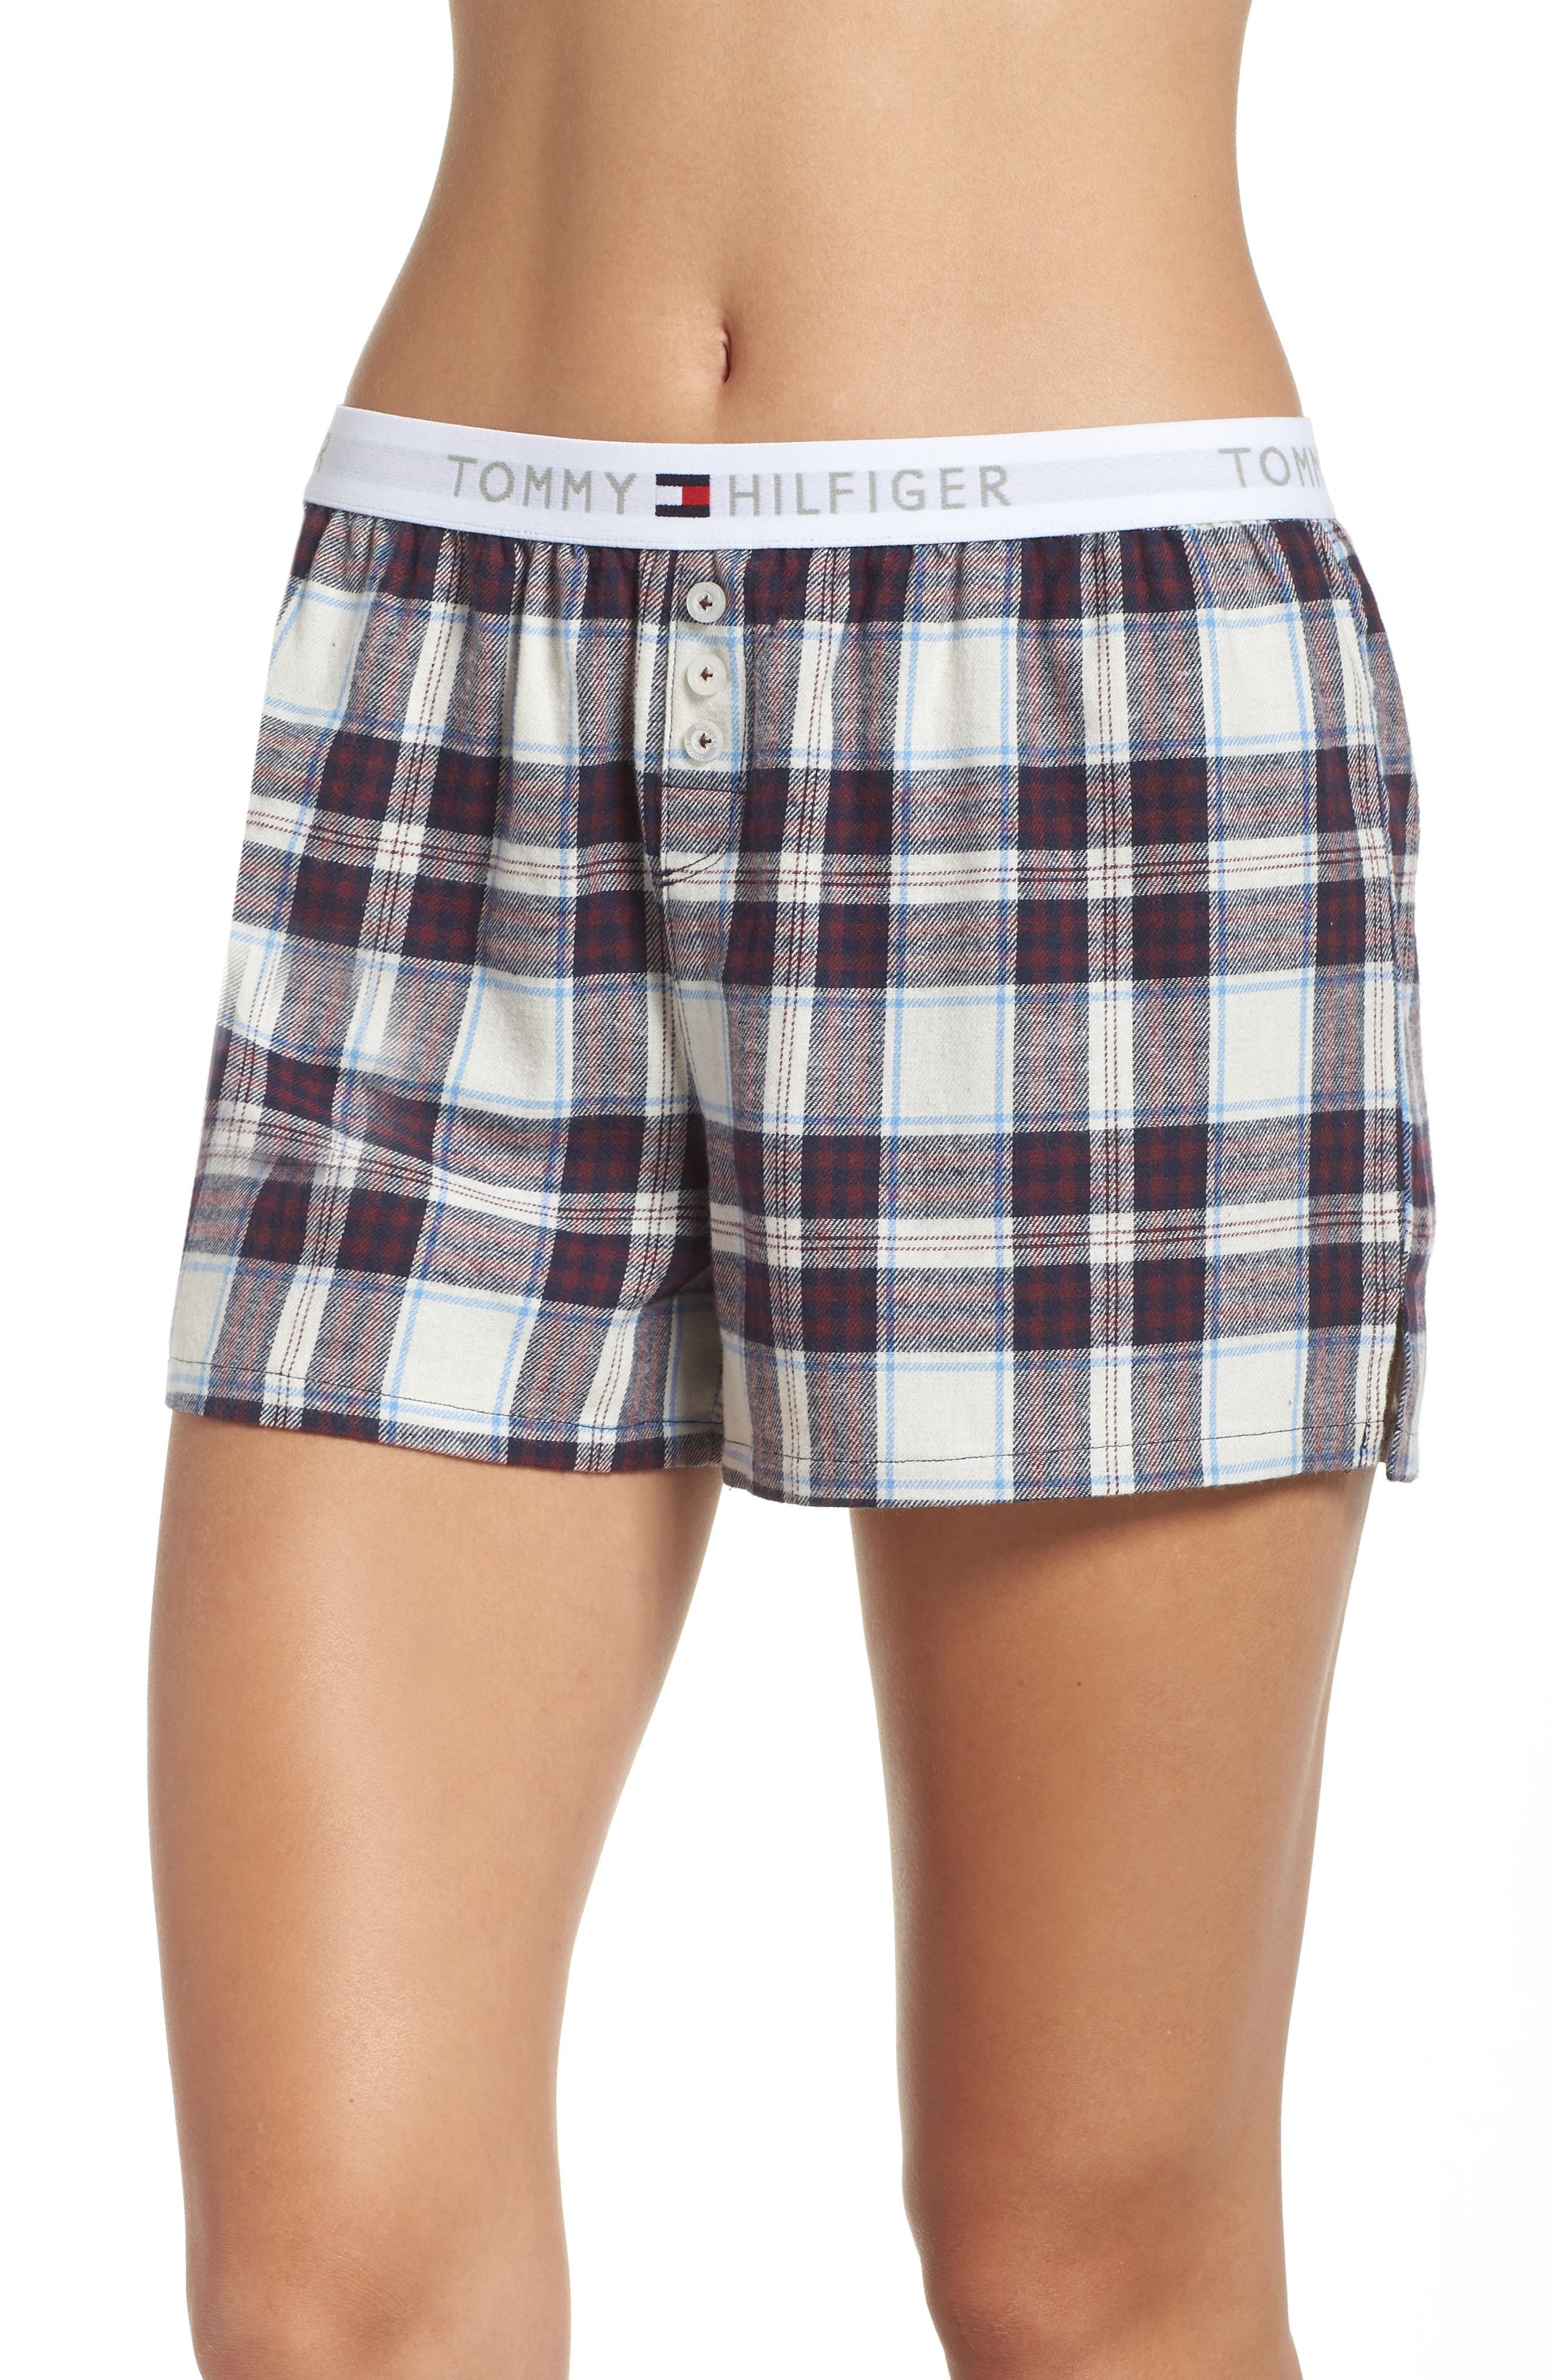 Plaid Pajama Shorts,                         Main,                         color, SWEET DREAMS FIG TARTAN